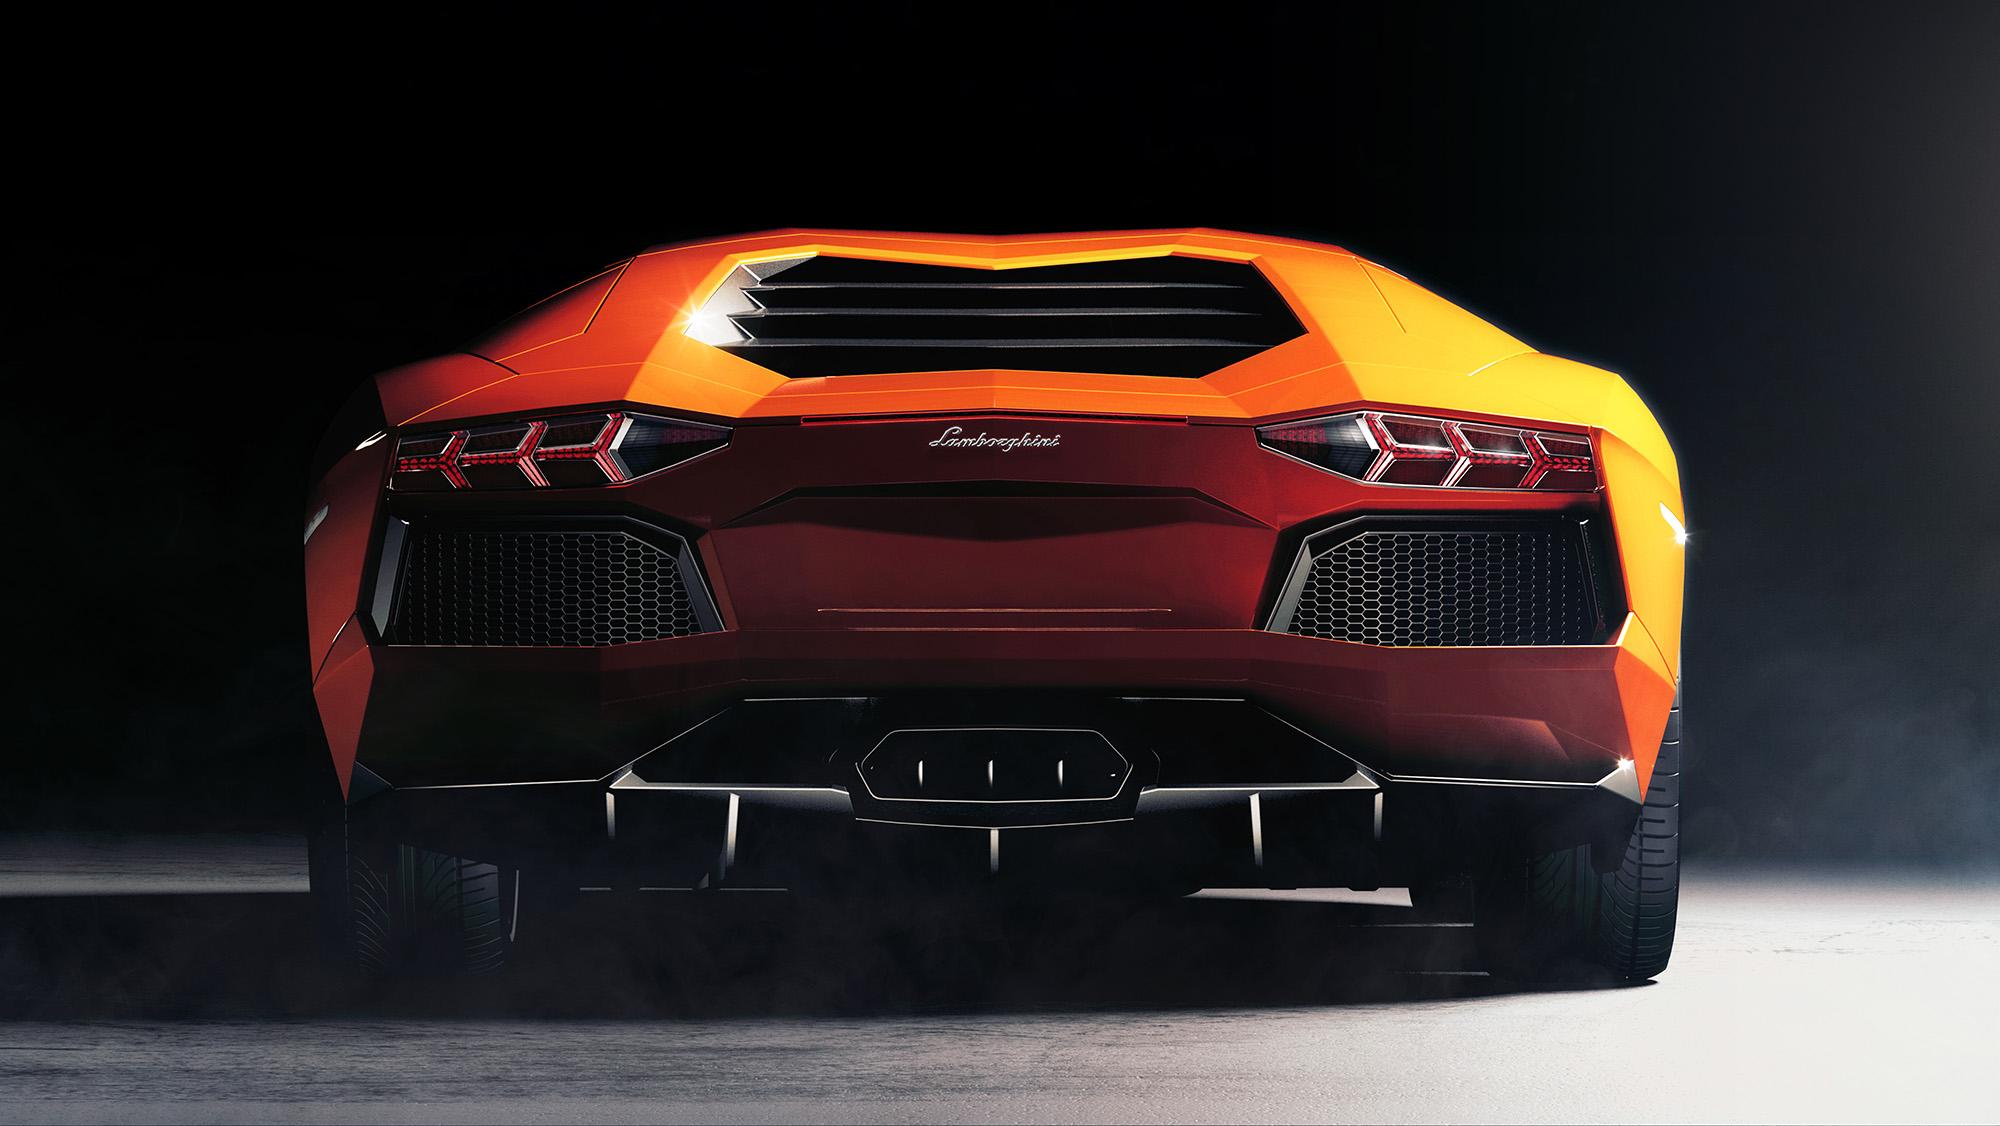 Lamborghini_rear_01_w6_LOWREZ.jpg